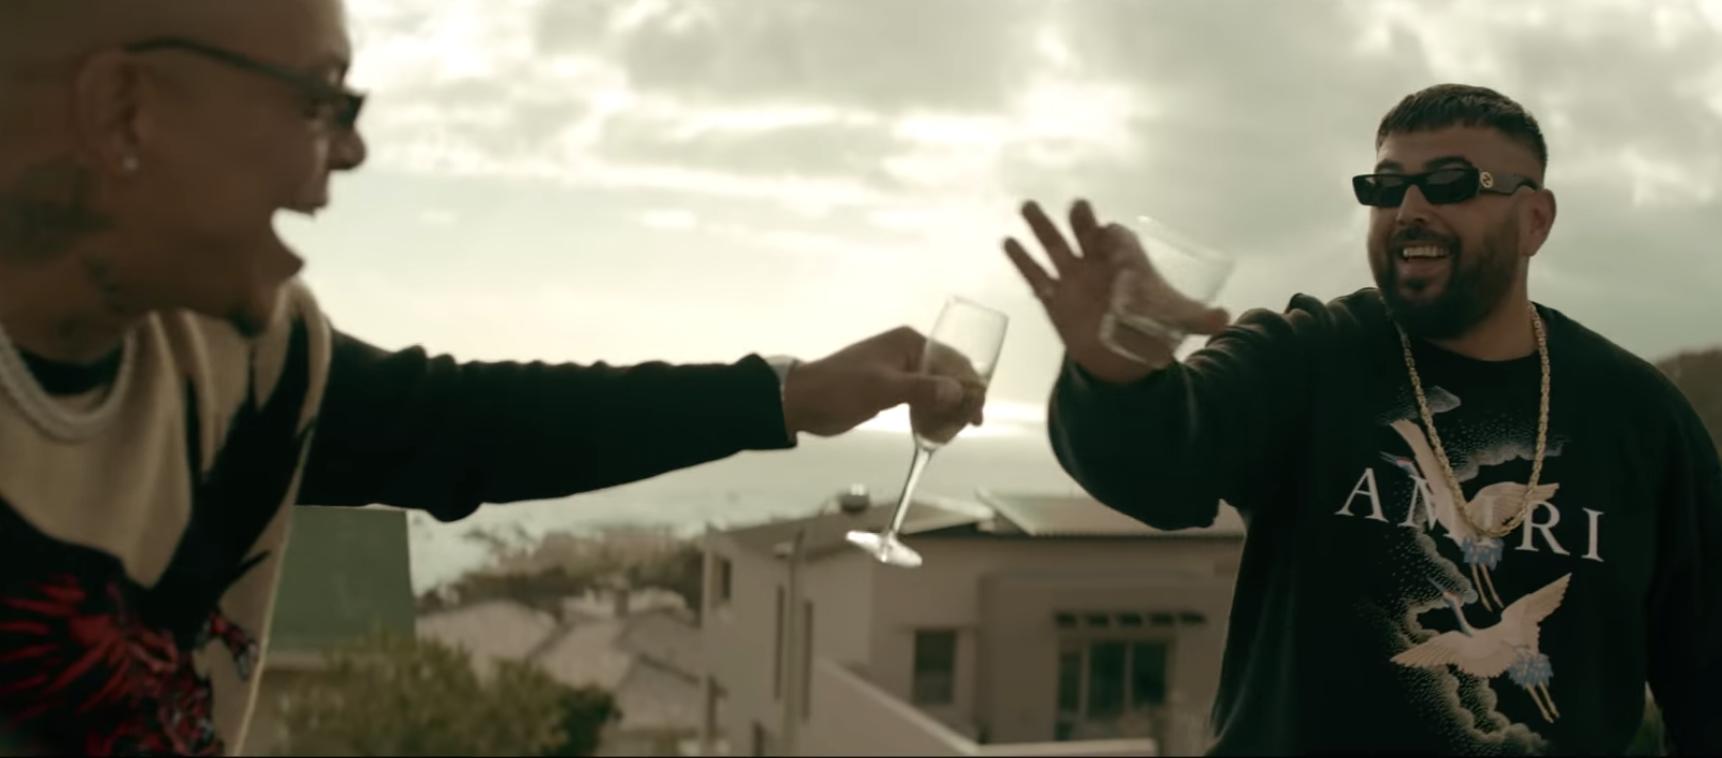 Summer Cem feat. Luciano - Summer Cem (Video) |16BARS